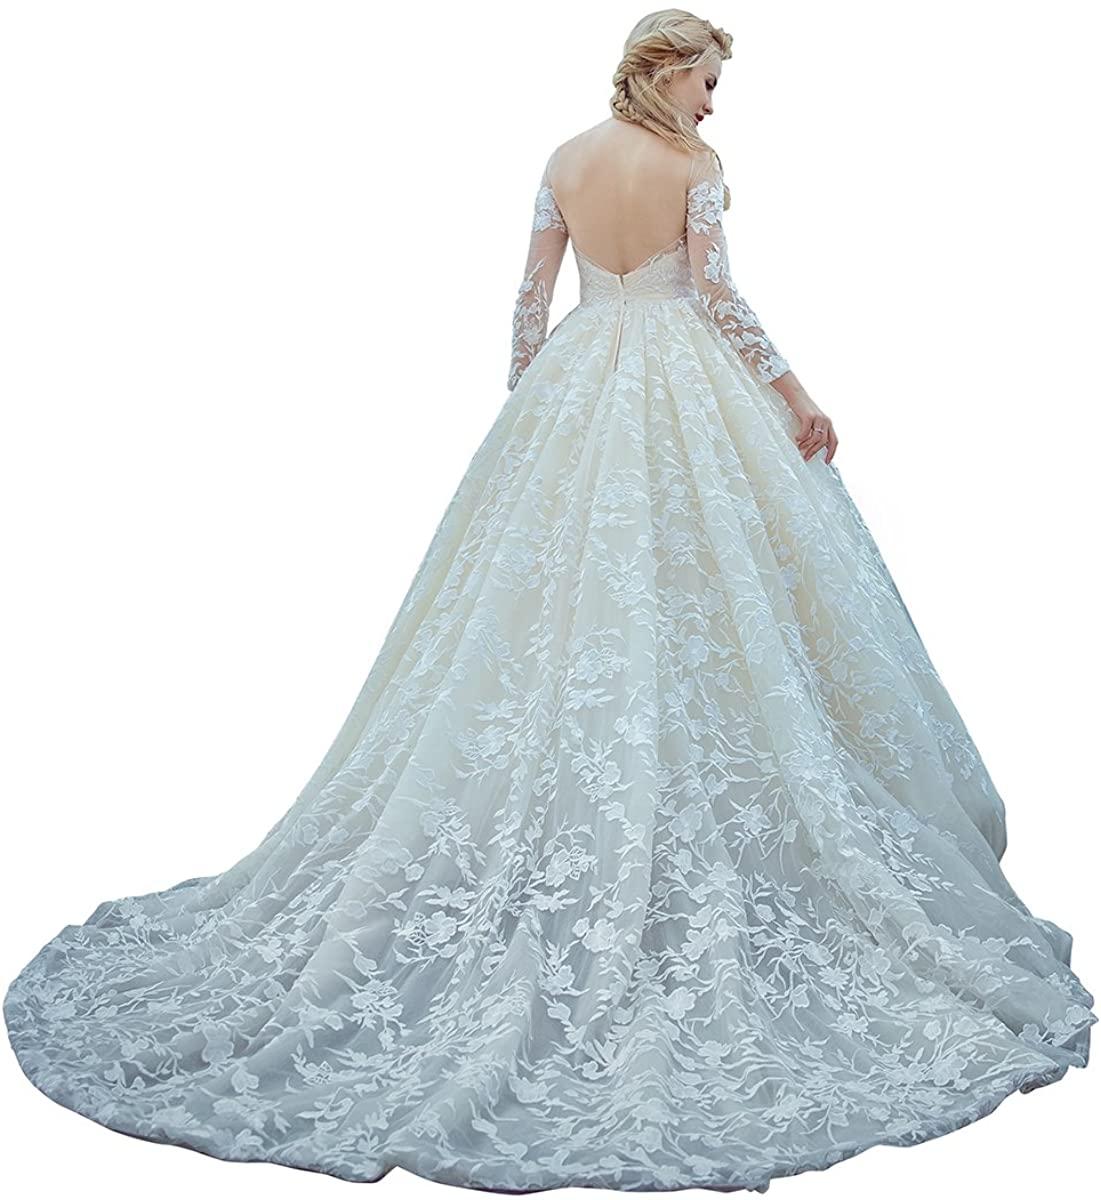 BAOFULIN Wedding Mermaid Wedding Dresses Formal Tulle Lace Appliques Pearls Long Sleeve Floor Length Bridal Gowns Custom